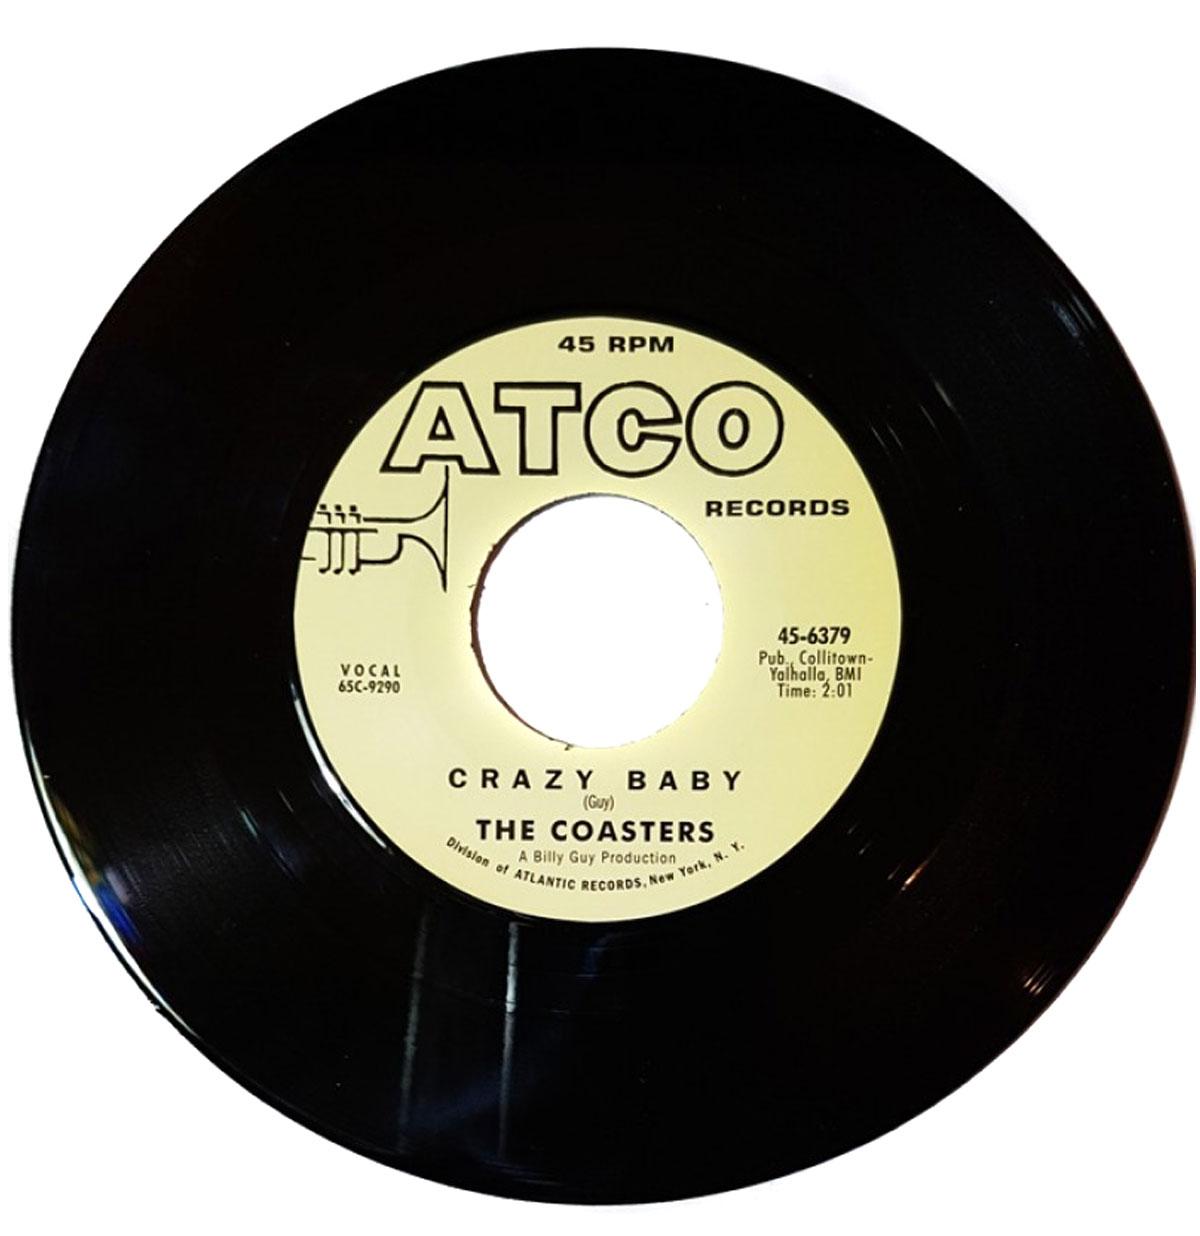 The Coasters - Crazy Baby Single